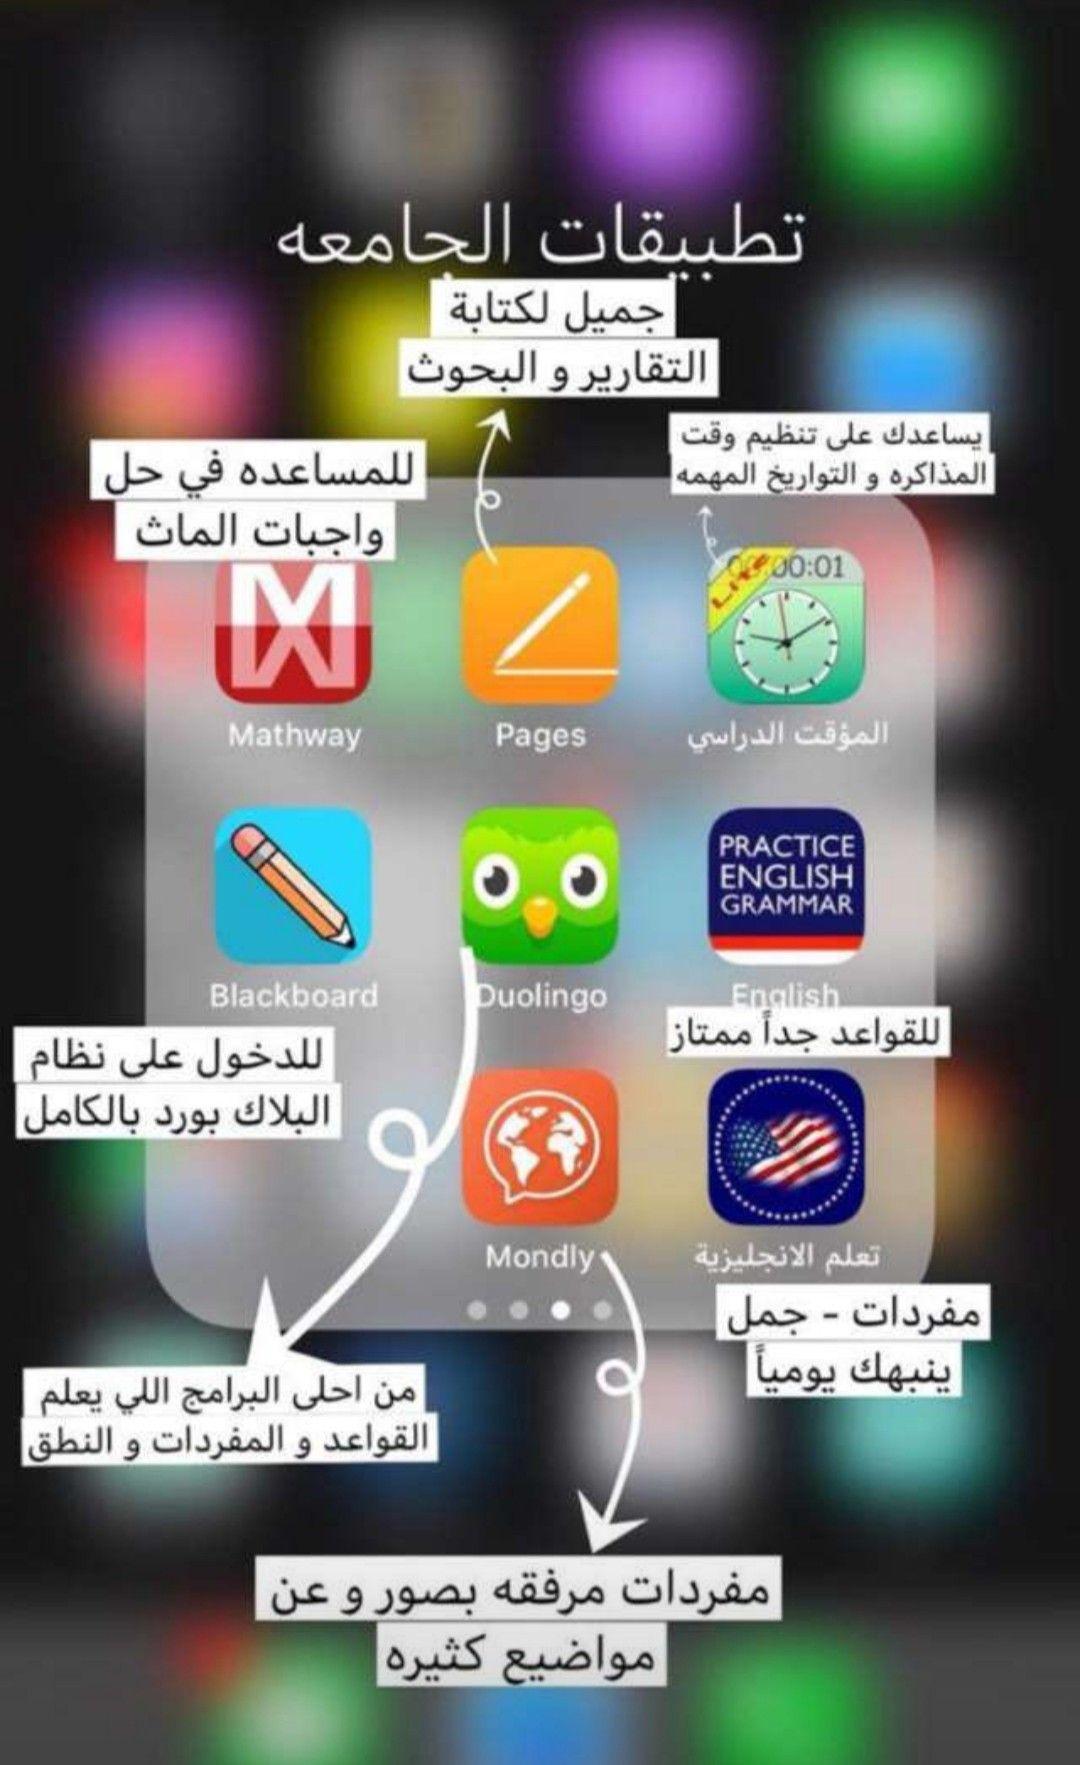 Pin By Mohammed Al Harbi On تقنية In 2020 Practice English Grammar English Grammar Grammar